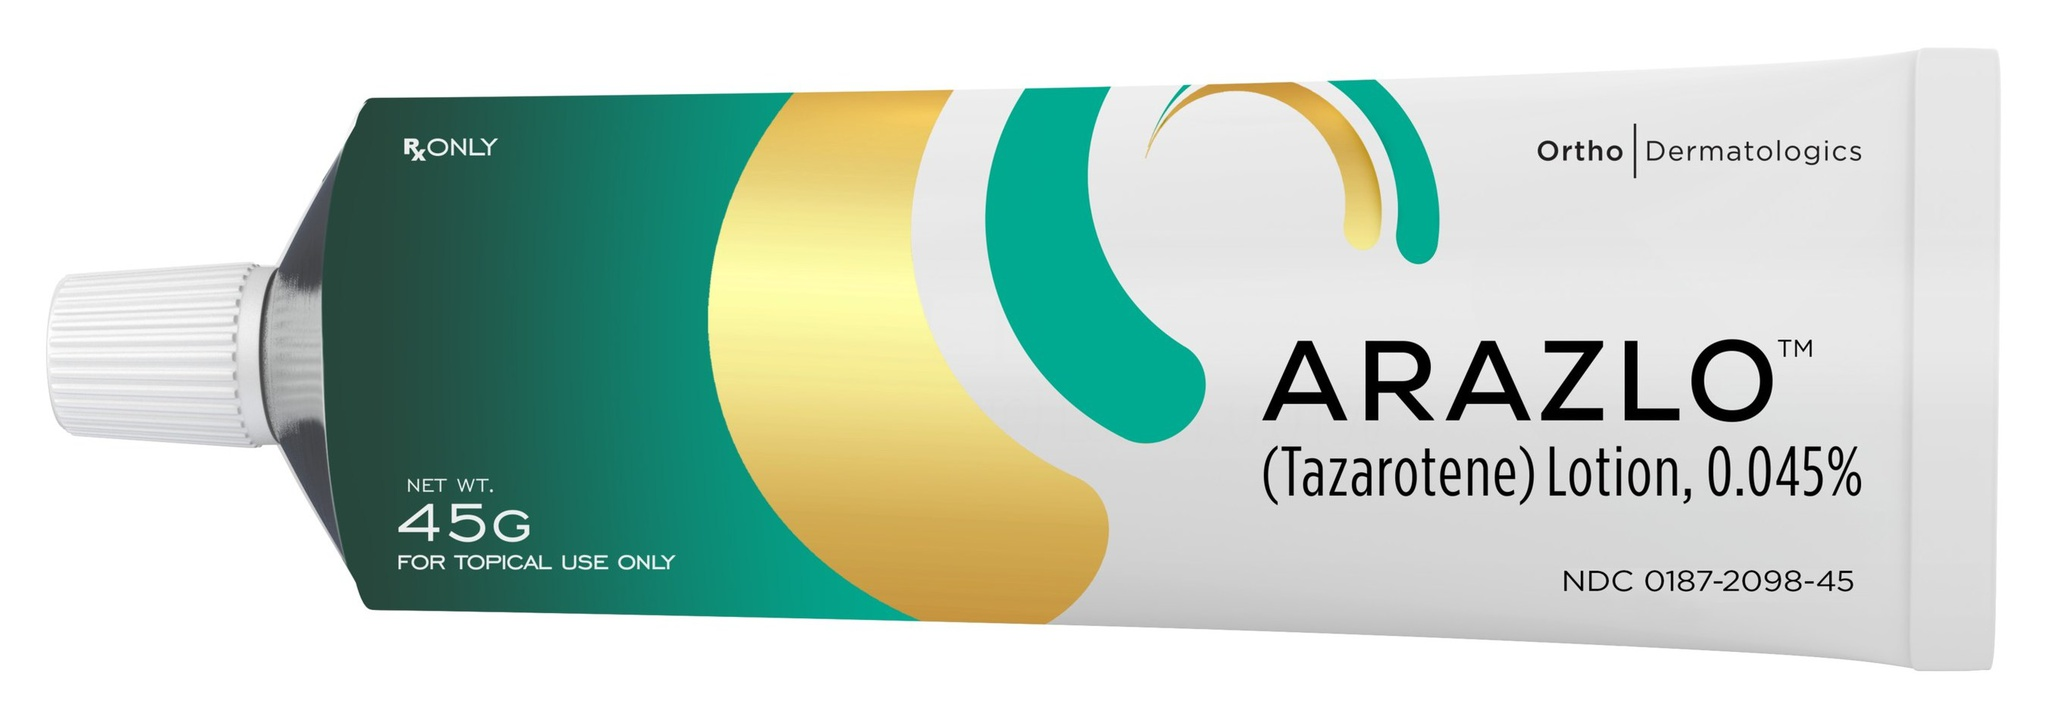 Ortho Dermatologics ARAZLO® (tazarotene) Lotion, 0.045%